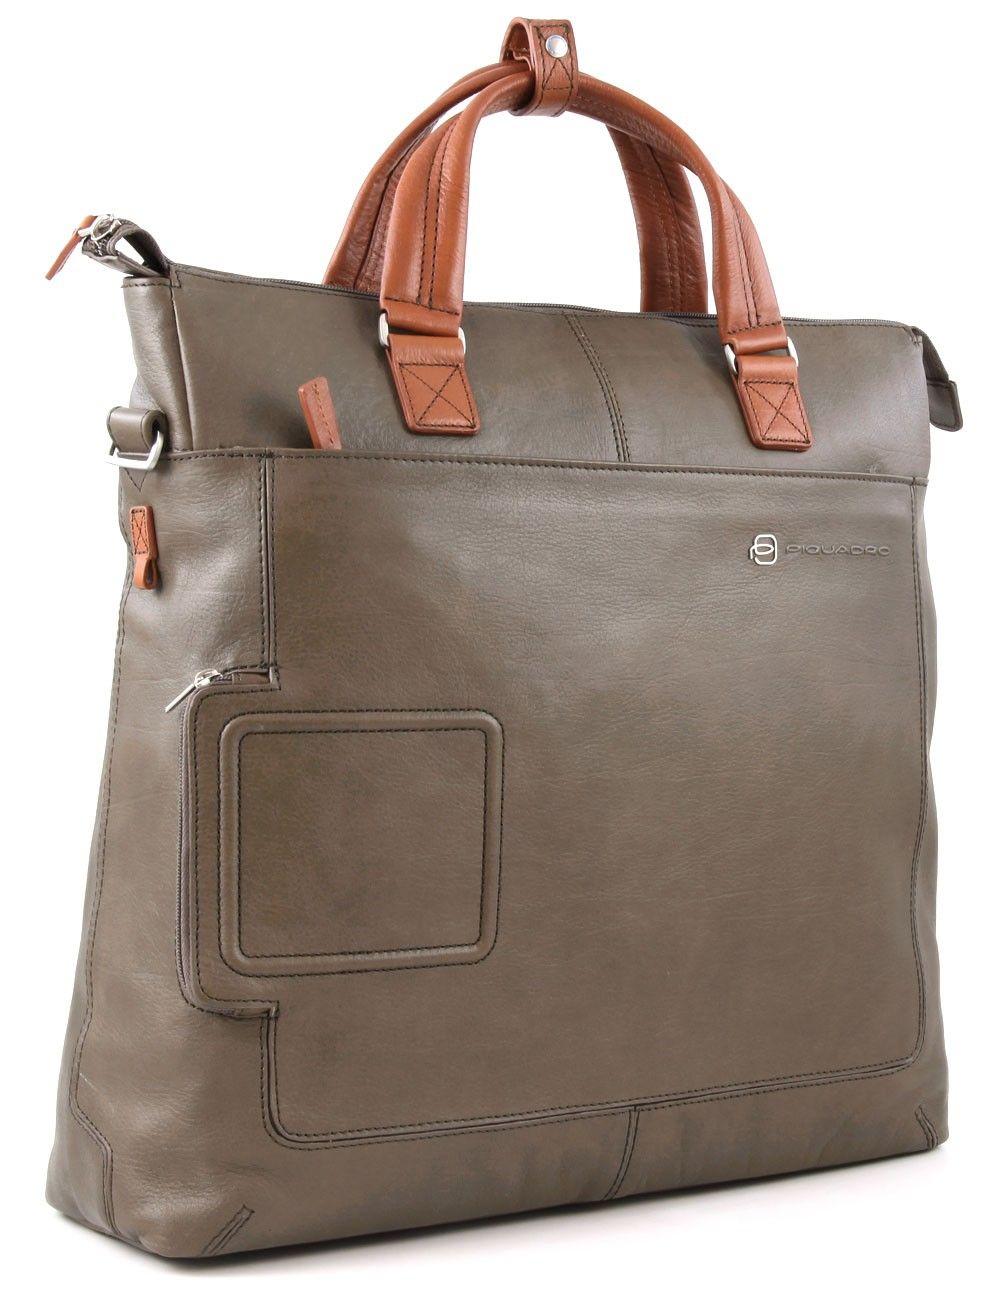 fc8776badfc1 Piquadro Vibe 15   Laptop Case Leather 40 cm - CA2813VI - Designer Bags  Shop - wardow.com